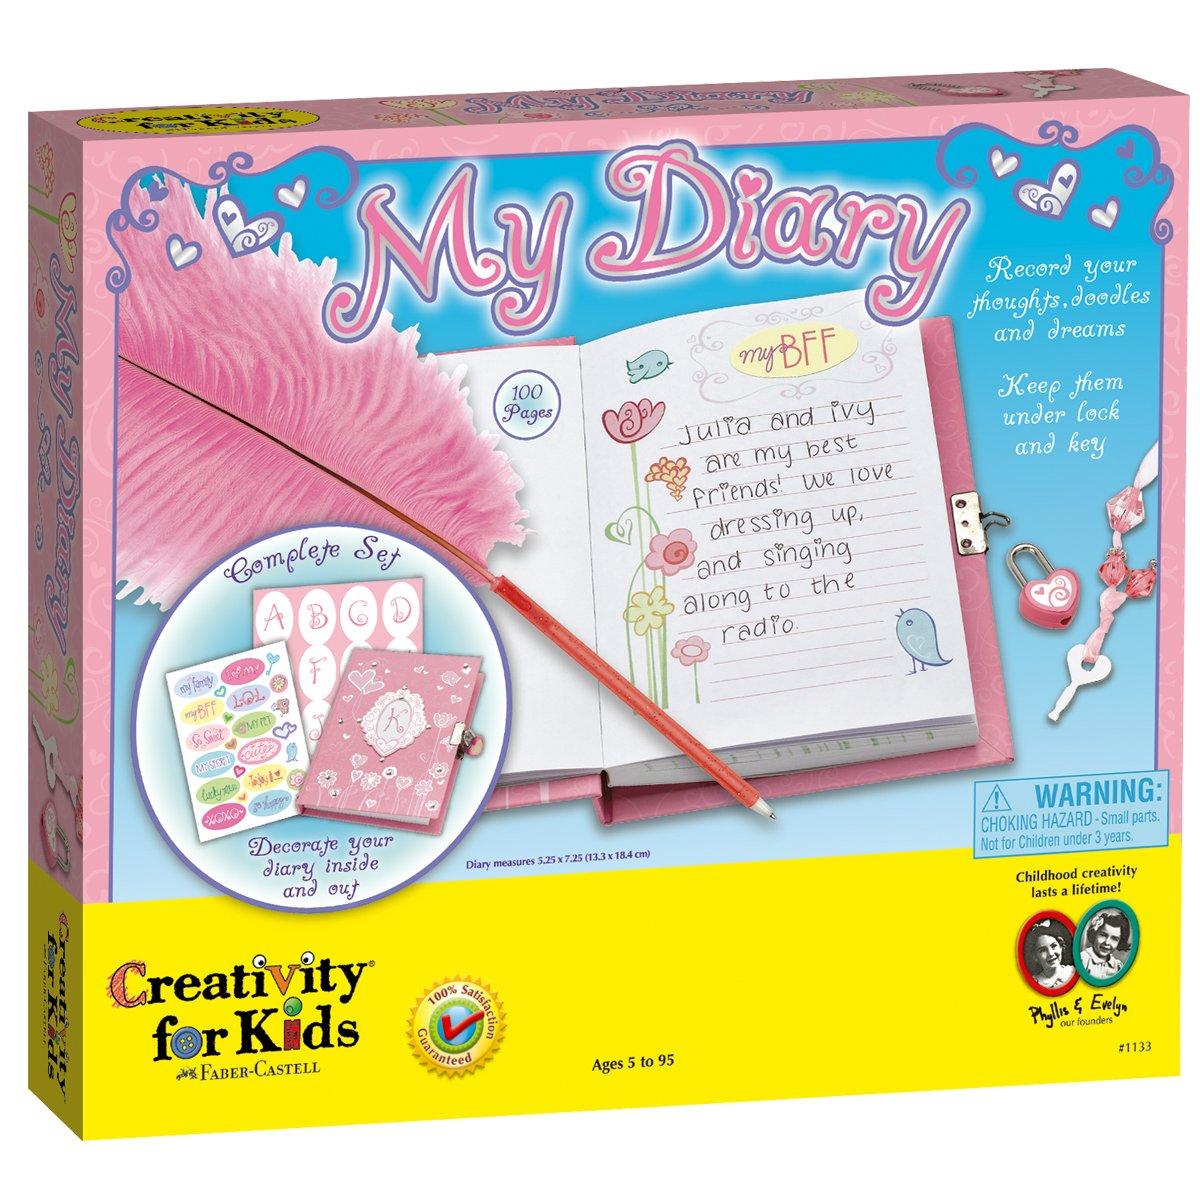 Creativity for Kids - Cfk1133 - Kit De Loisirs Créatifs - Mon Journal Intime 1133000